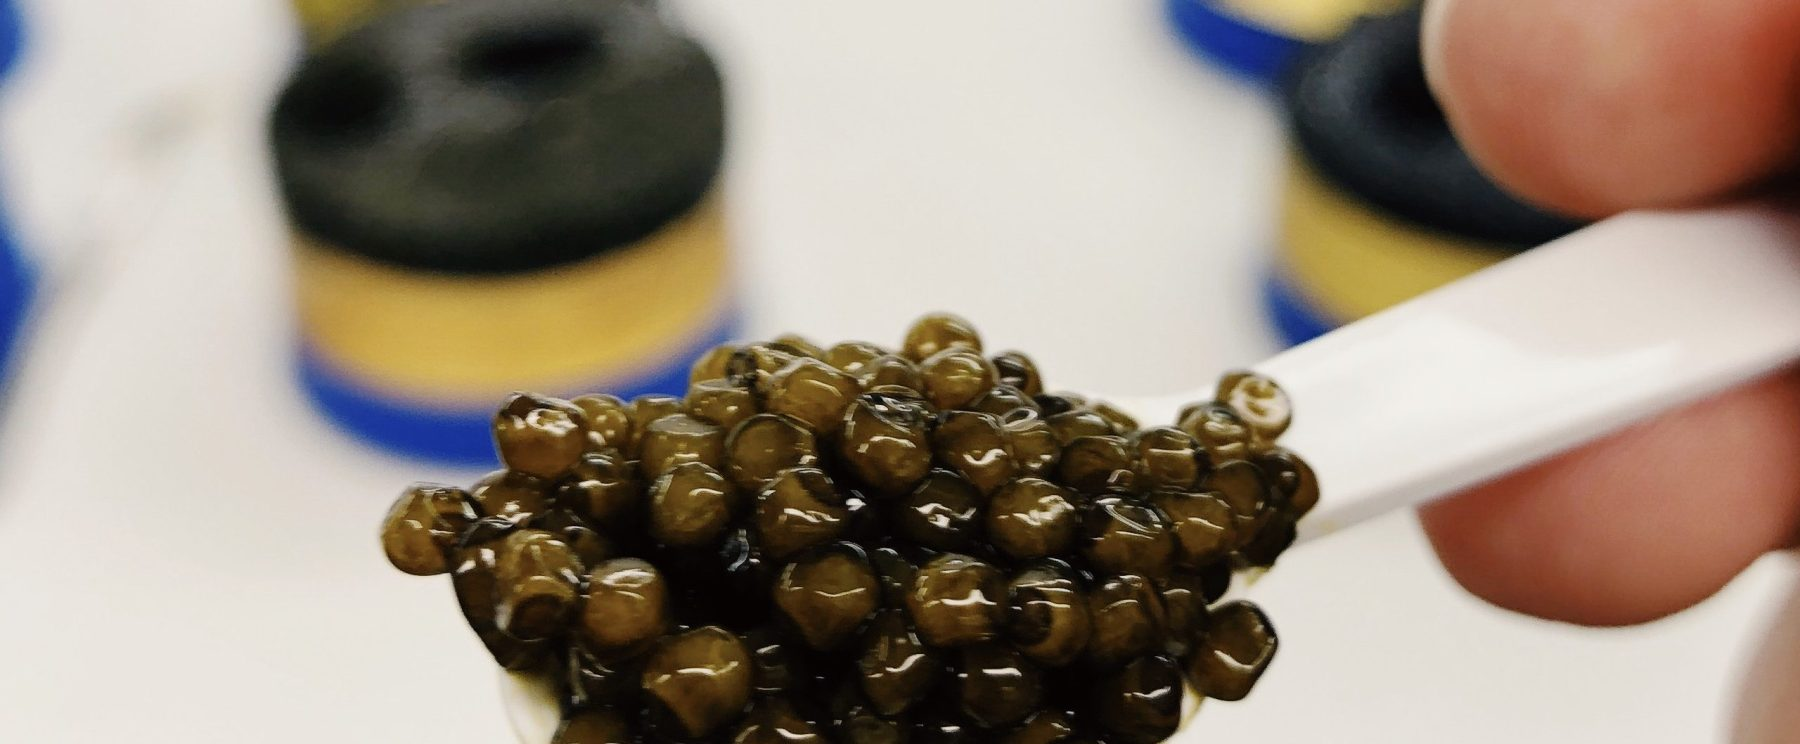 High-end caviar by Petrossian